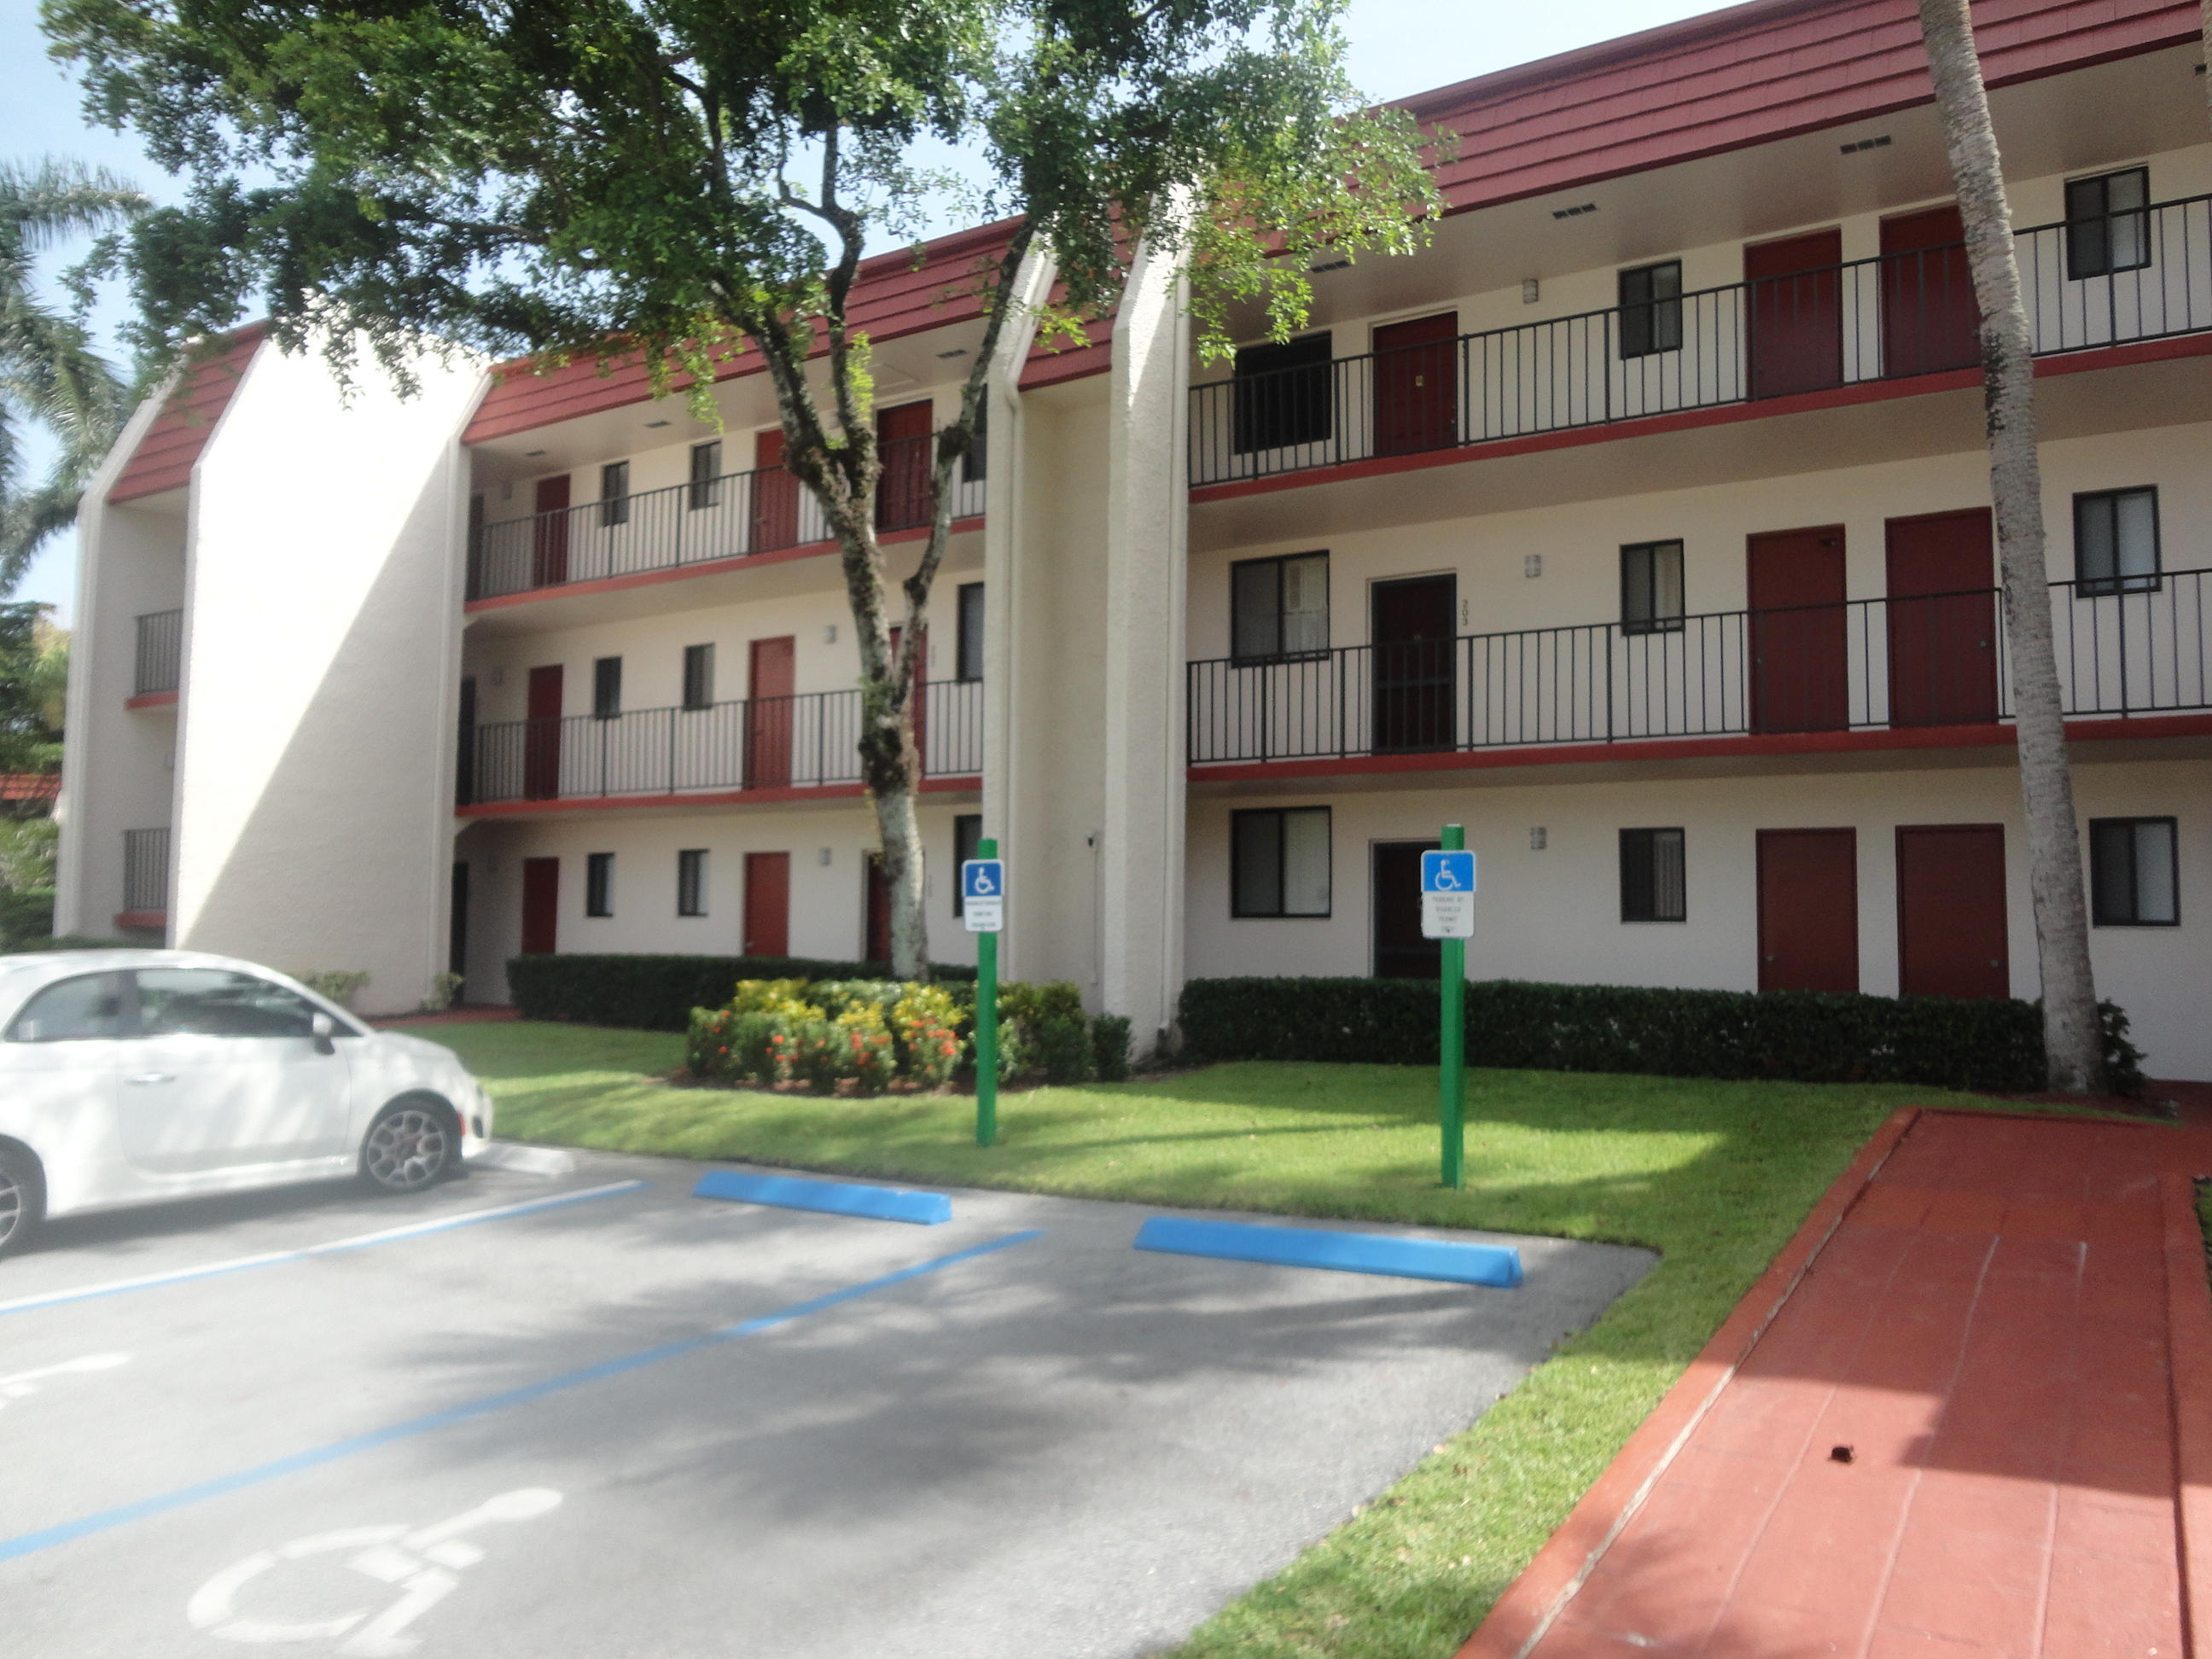 4393 Trevi Court, Lake Worth, Florida 33467, 2 Bedrooms Bedrooms, ,1.1 BathroomsBathrooms,Condo/Coop,For Rent,Trevi,3,RX-10454546